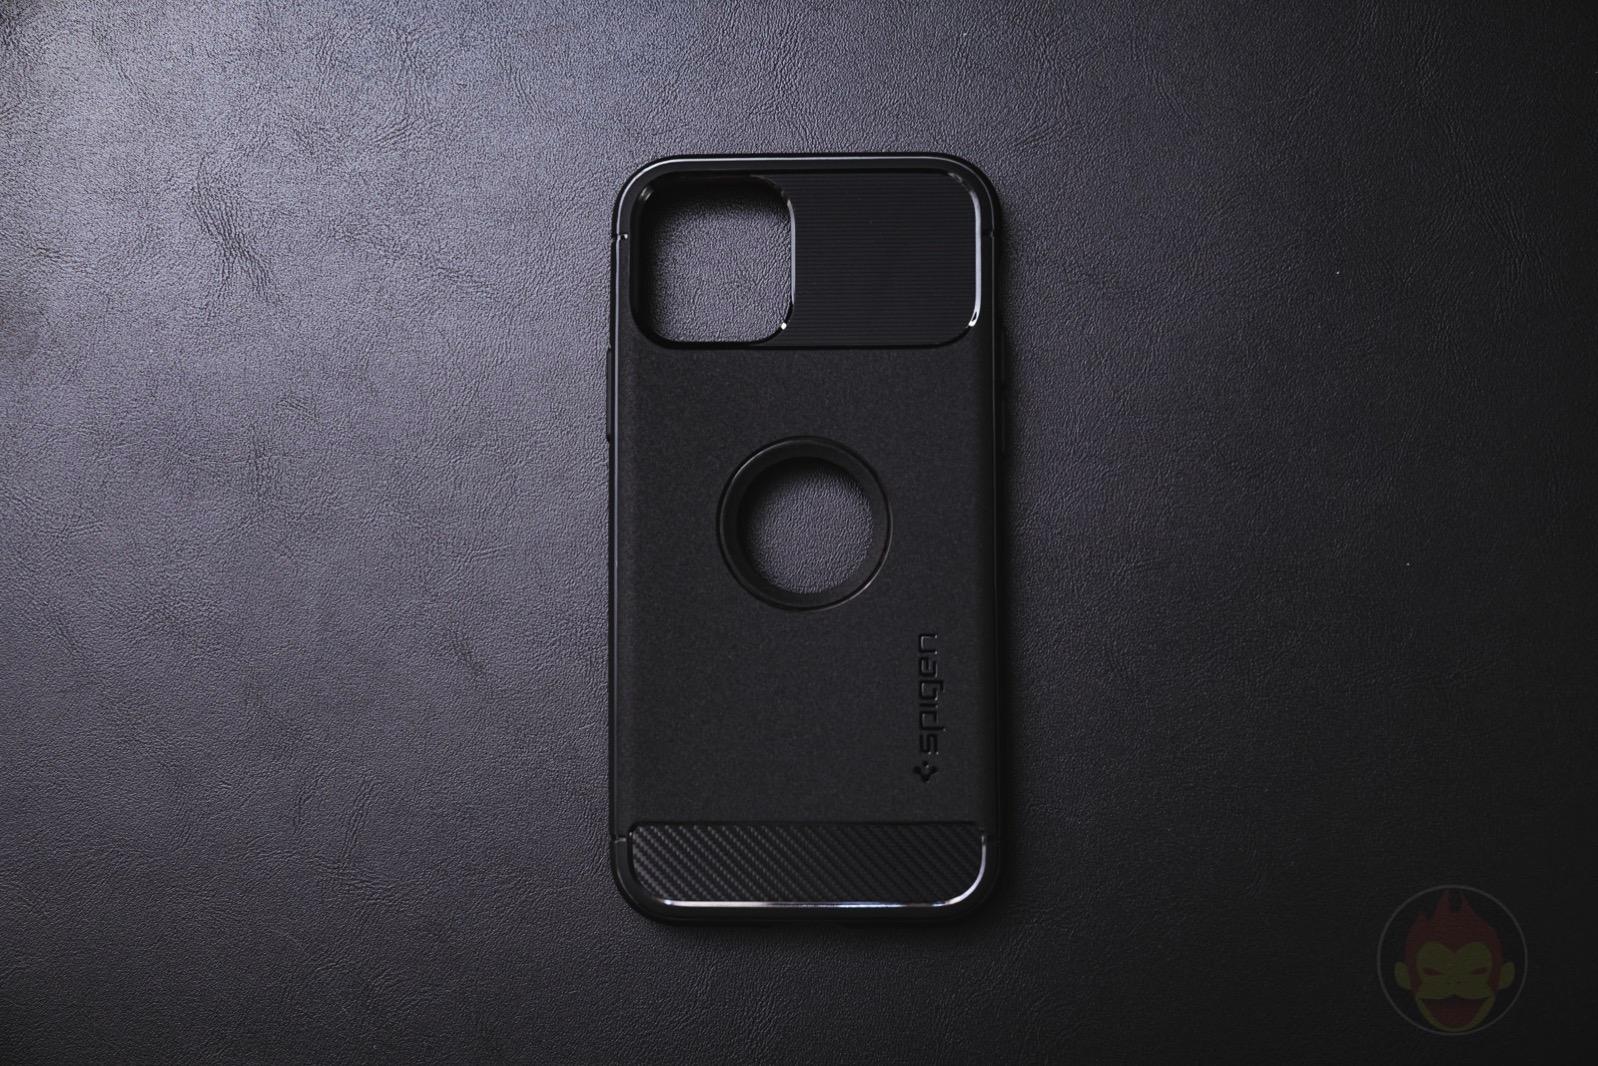 Spigen-iPhone-11-Pro-Case-Review-02.jpg